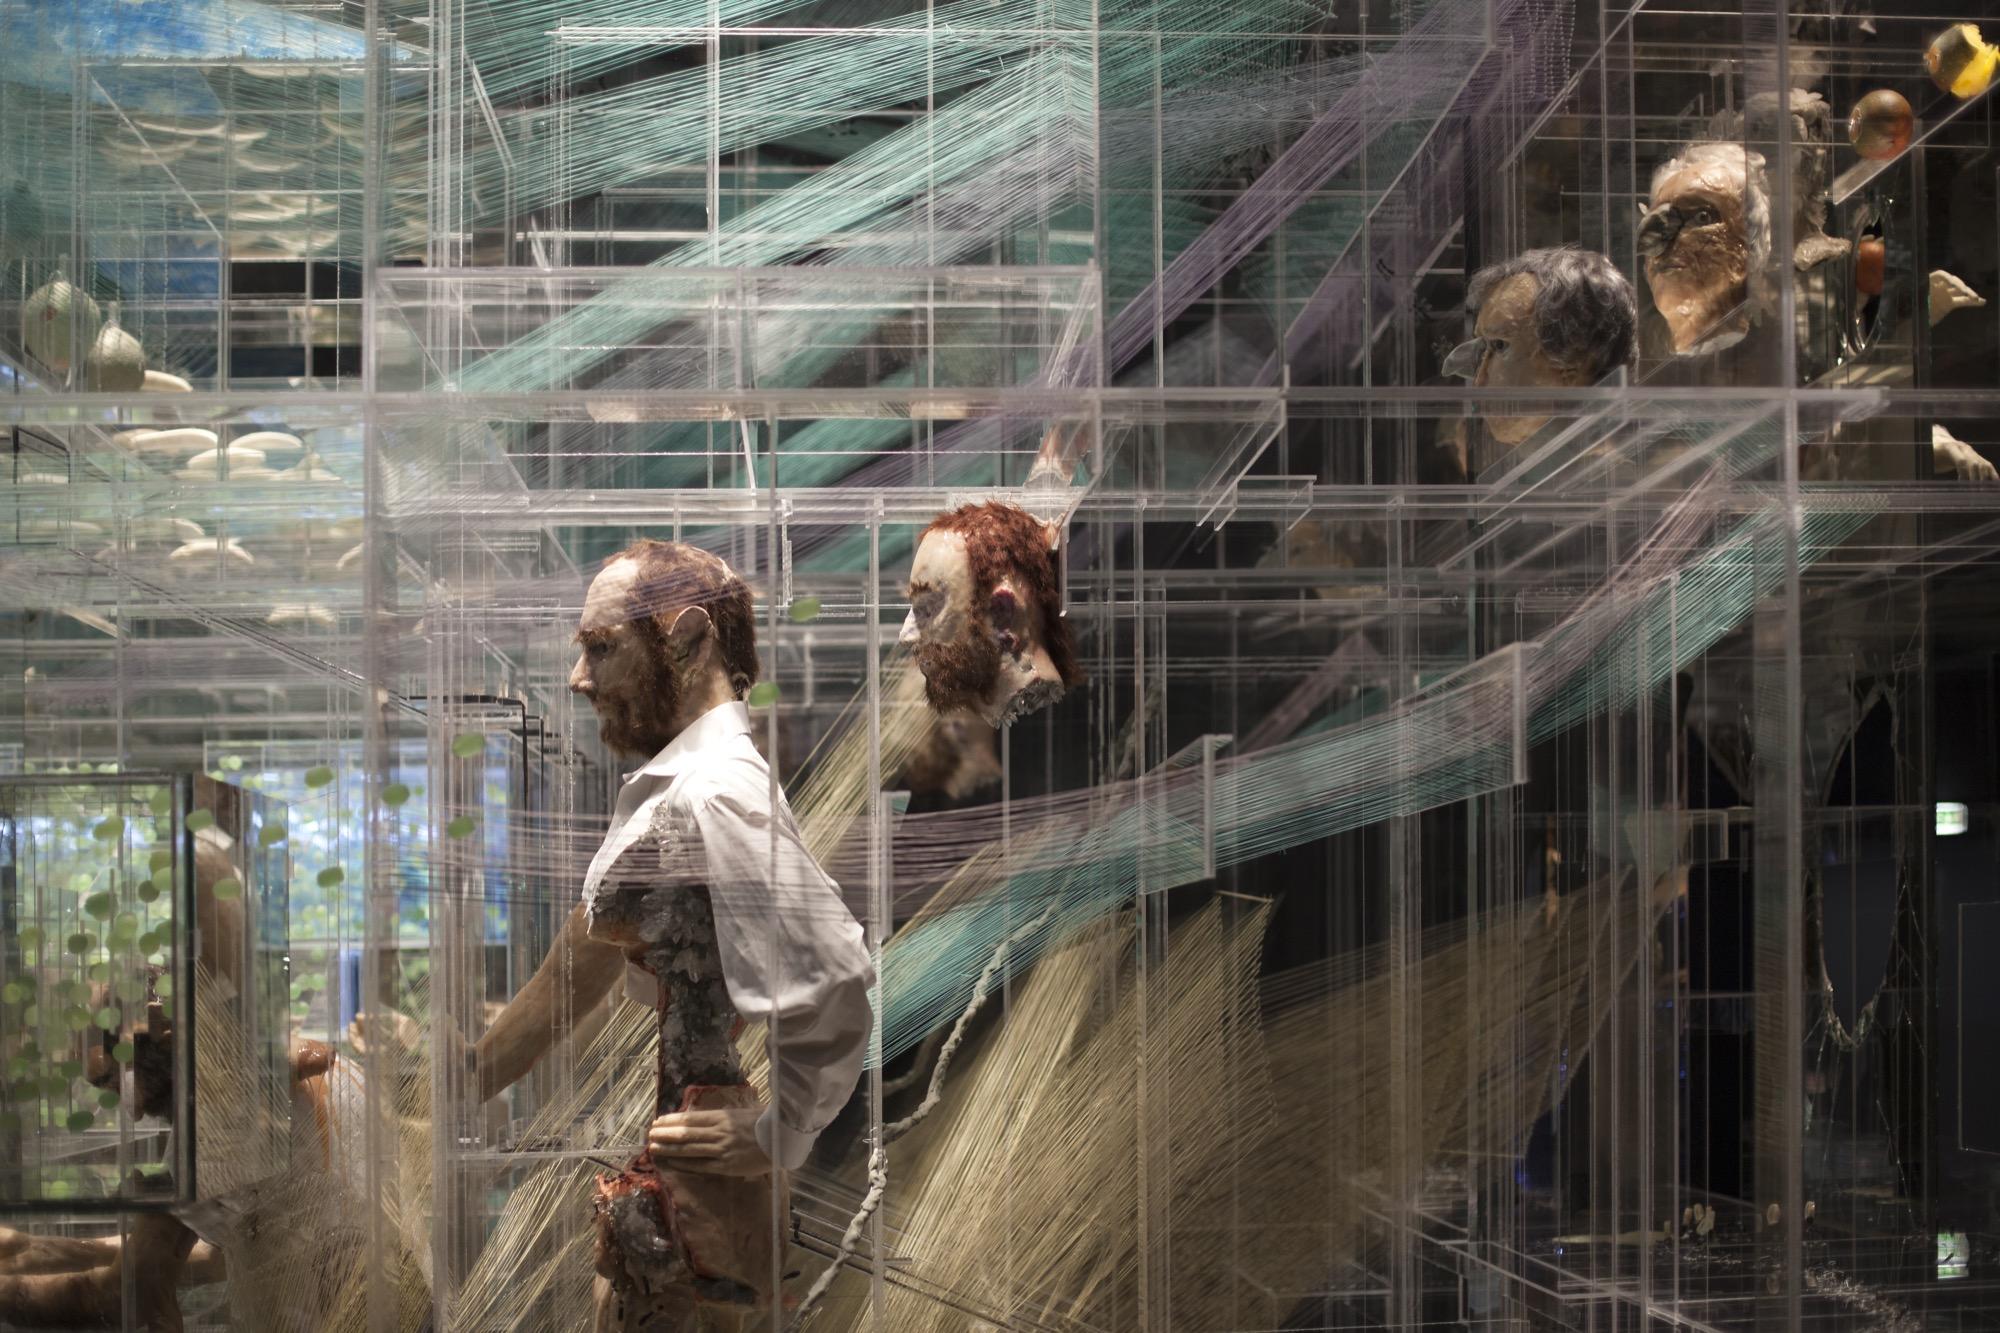 David Altmejd 111115 24 - Photo by Poul Buchard - Brondum and Co - Courtesy Louisiana Museum of Modern Art, Denmark.jpg